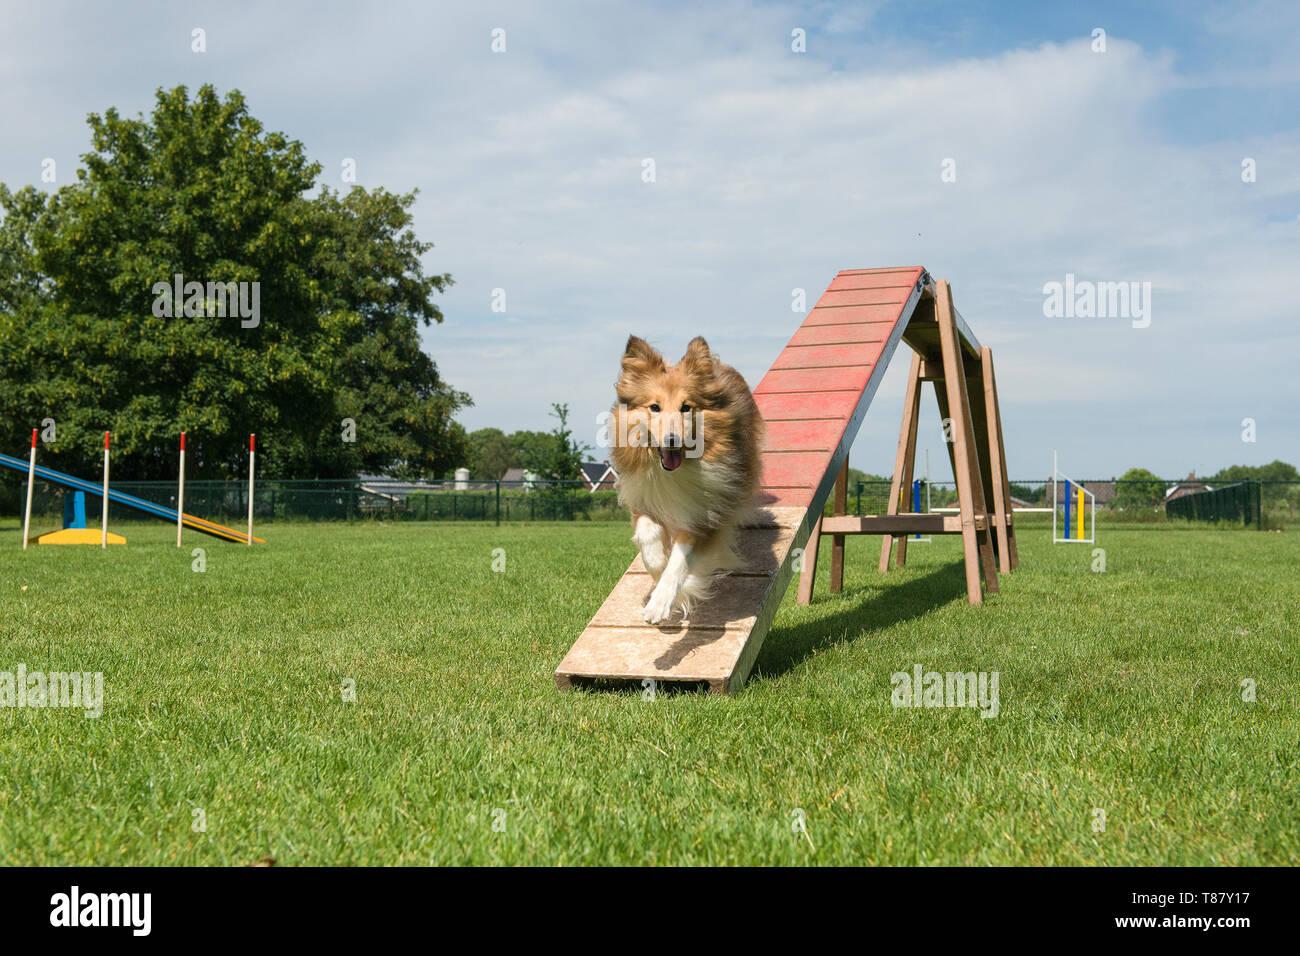 Shetland sheepdog running of a dog walk on a agility course - Stock Image